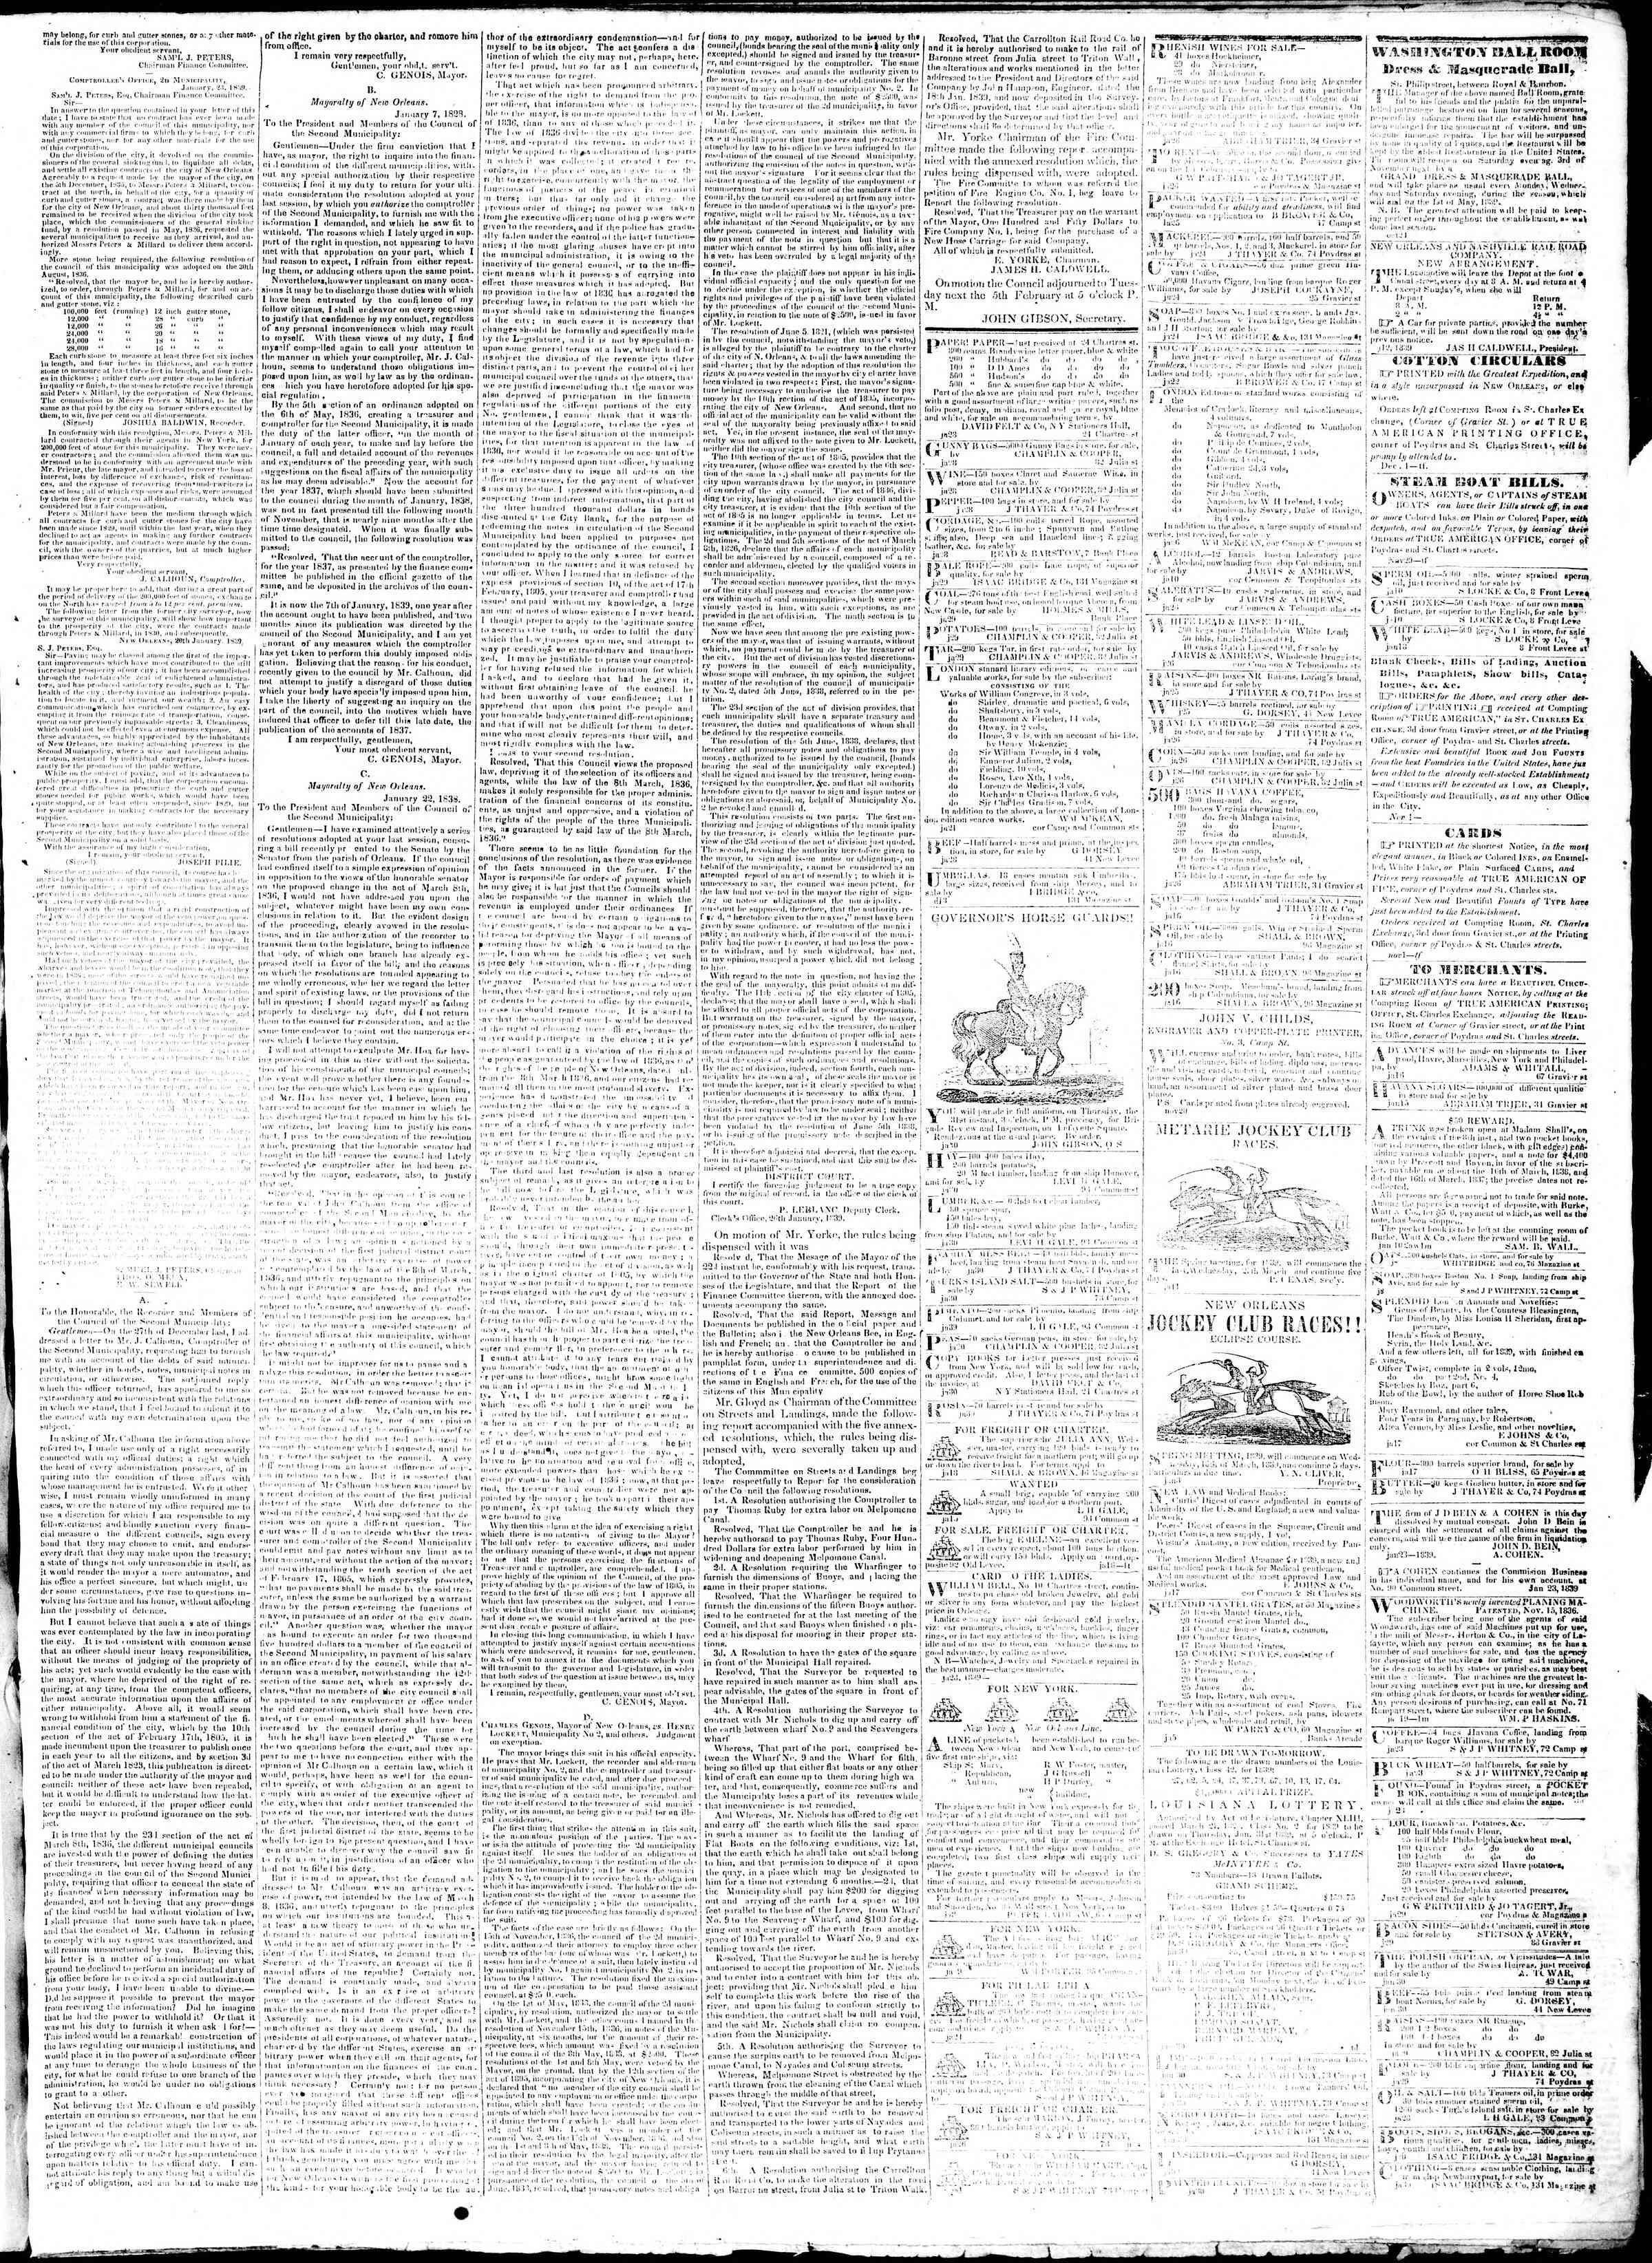 January 31, 1839 Tarihli True American Gazetesi Sayfa 3